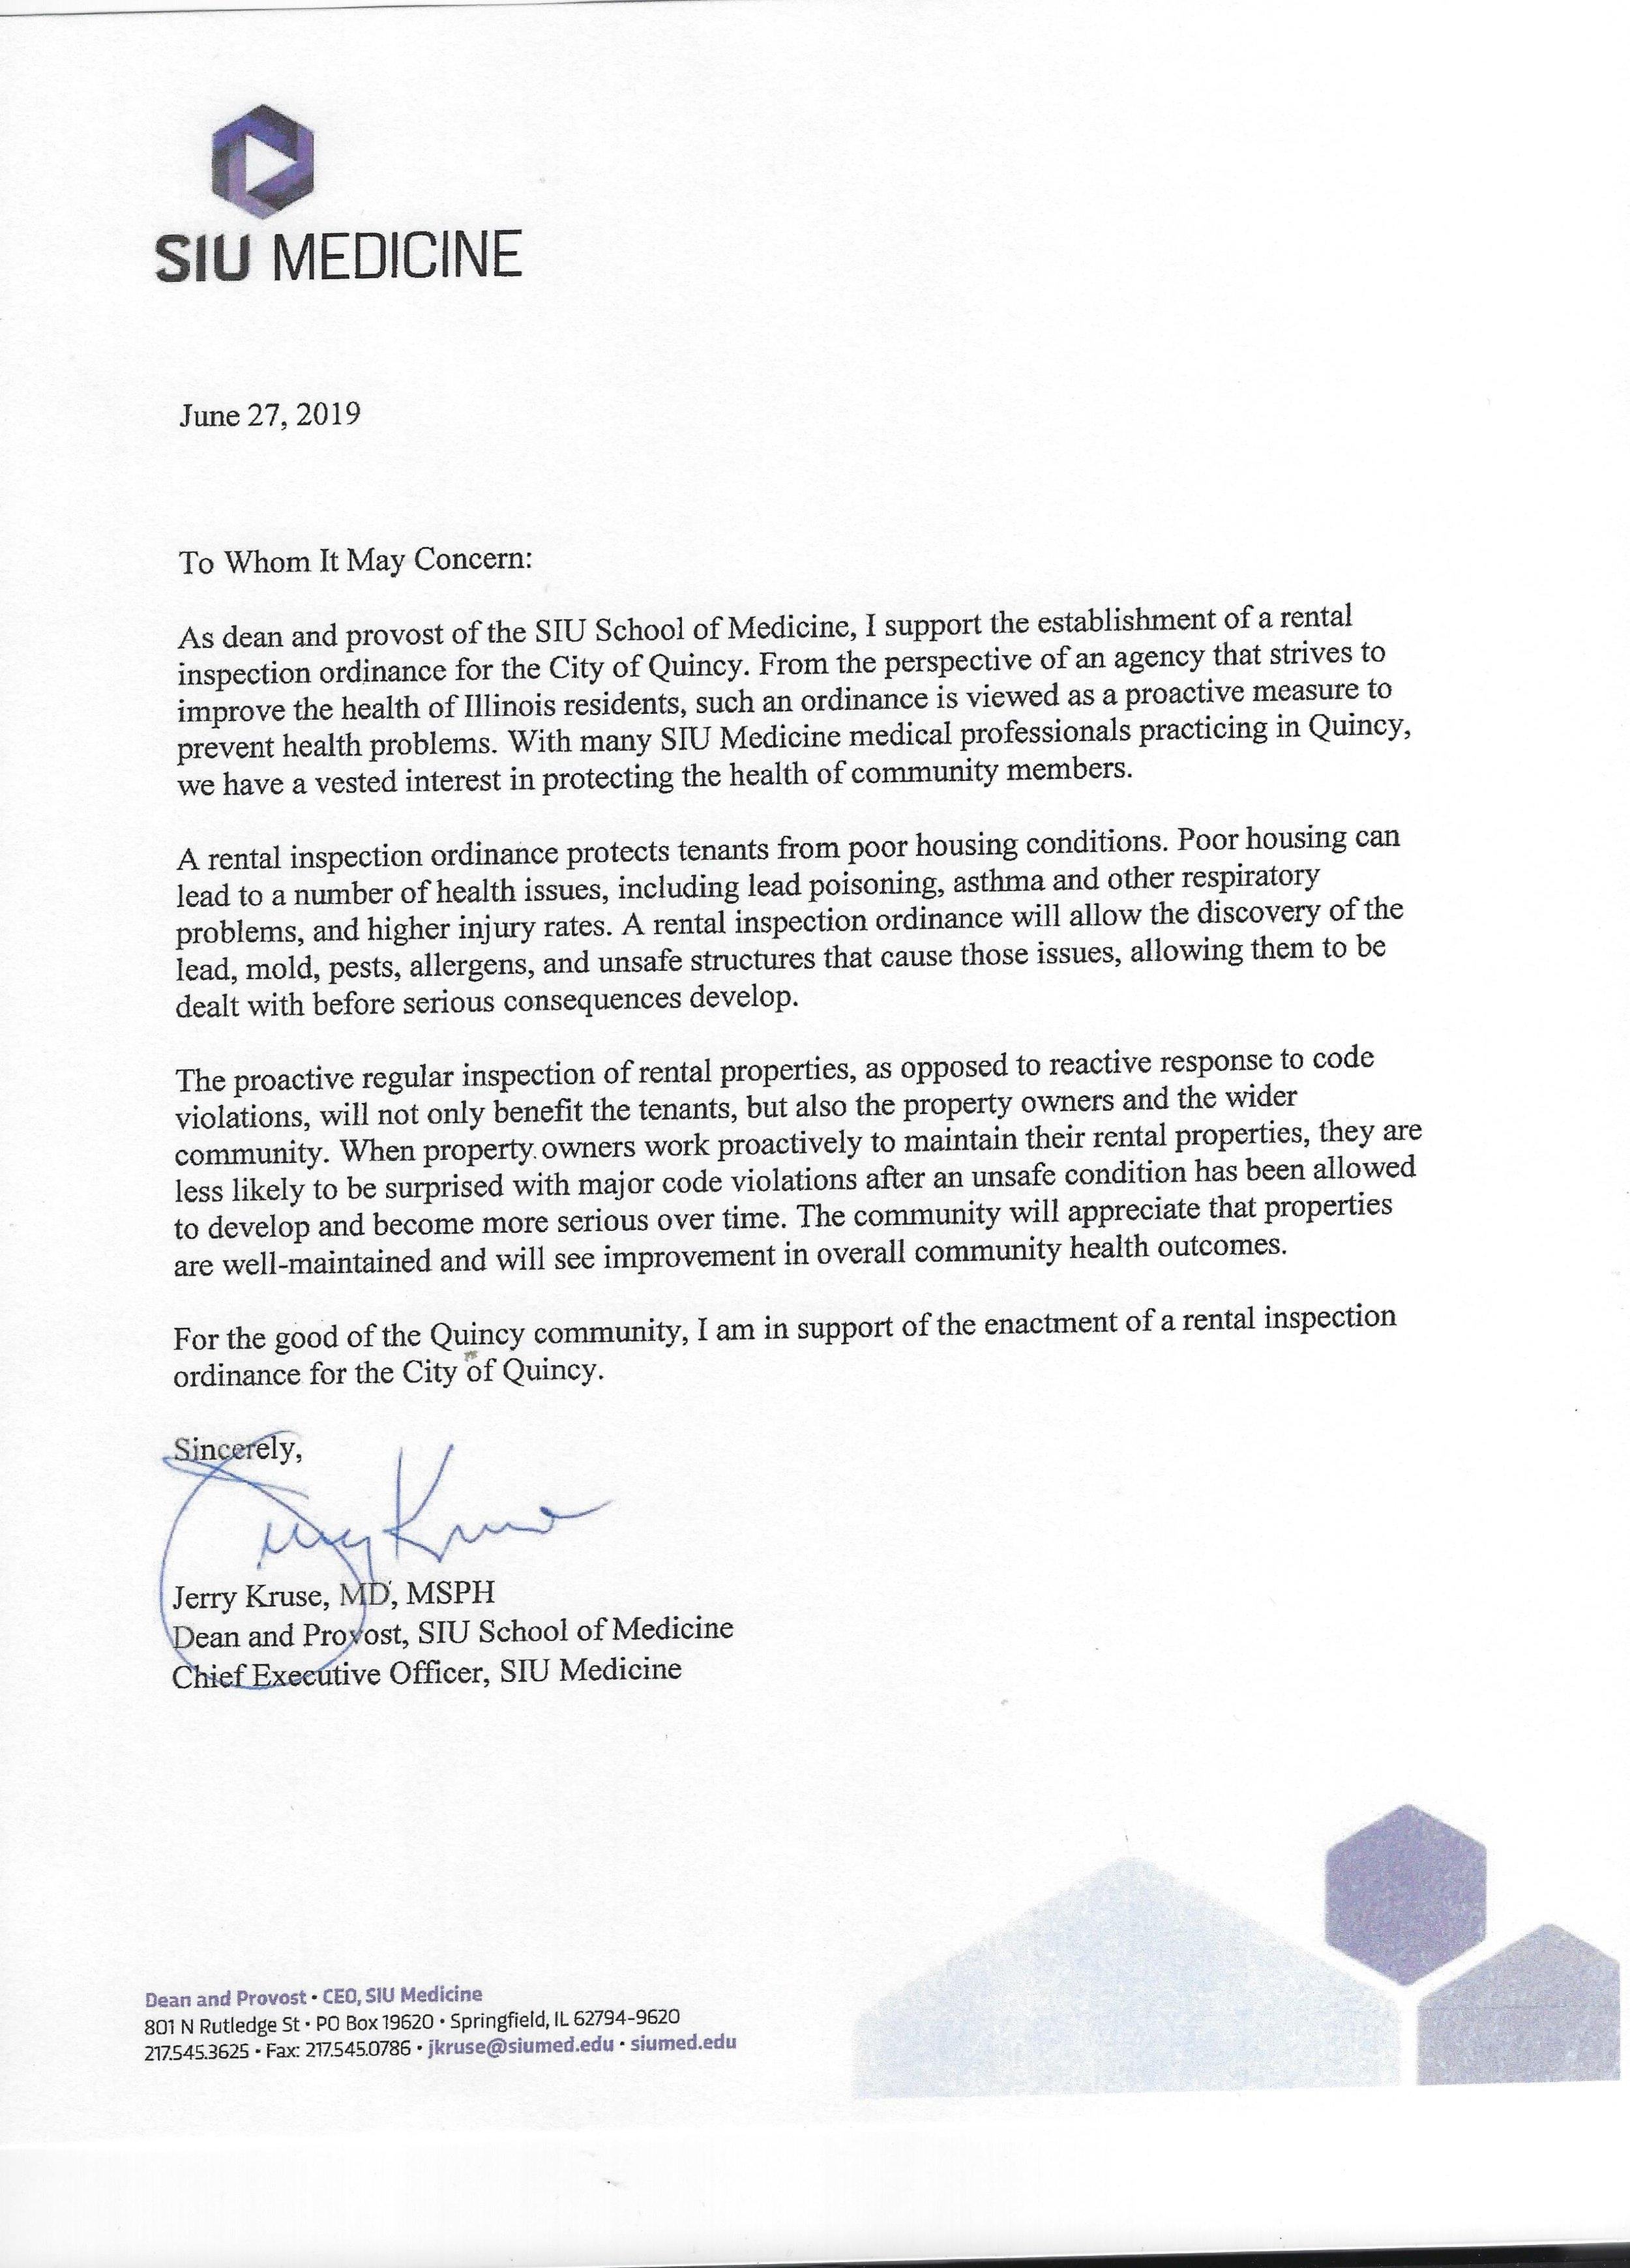 QIPP SIU Medicine Letter of Support.jpeg